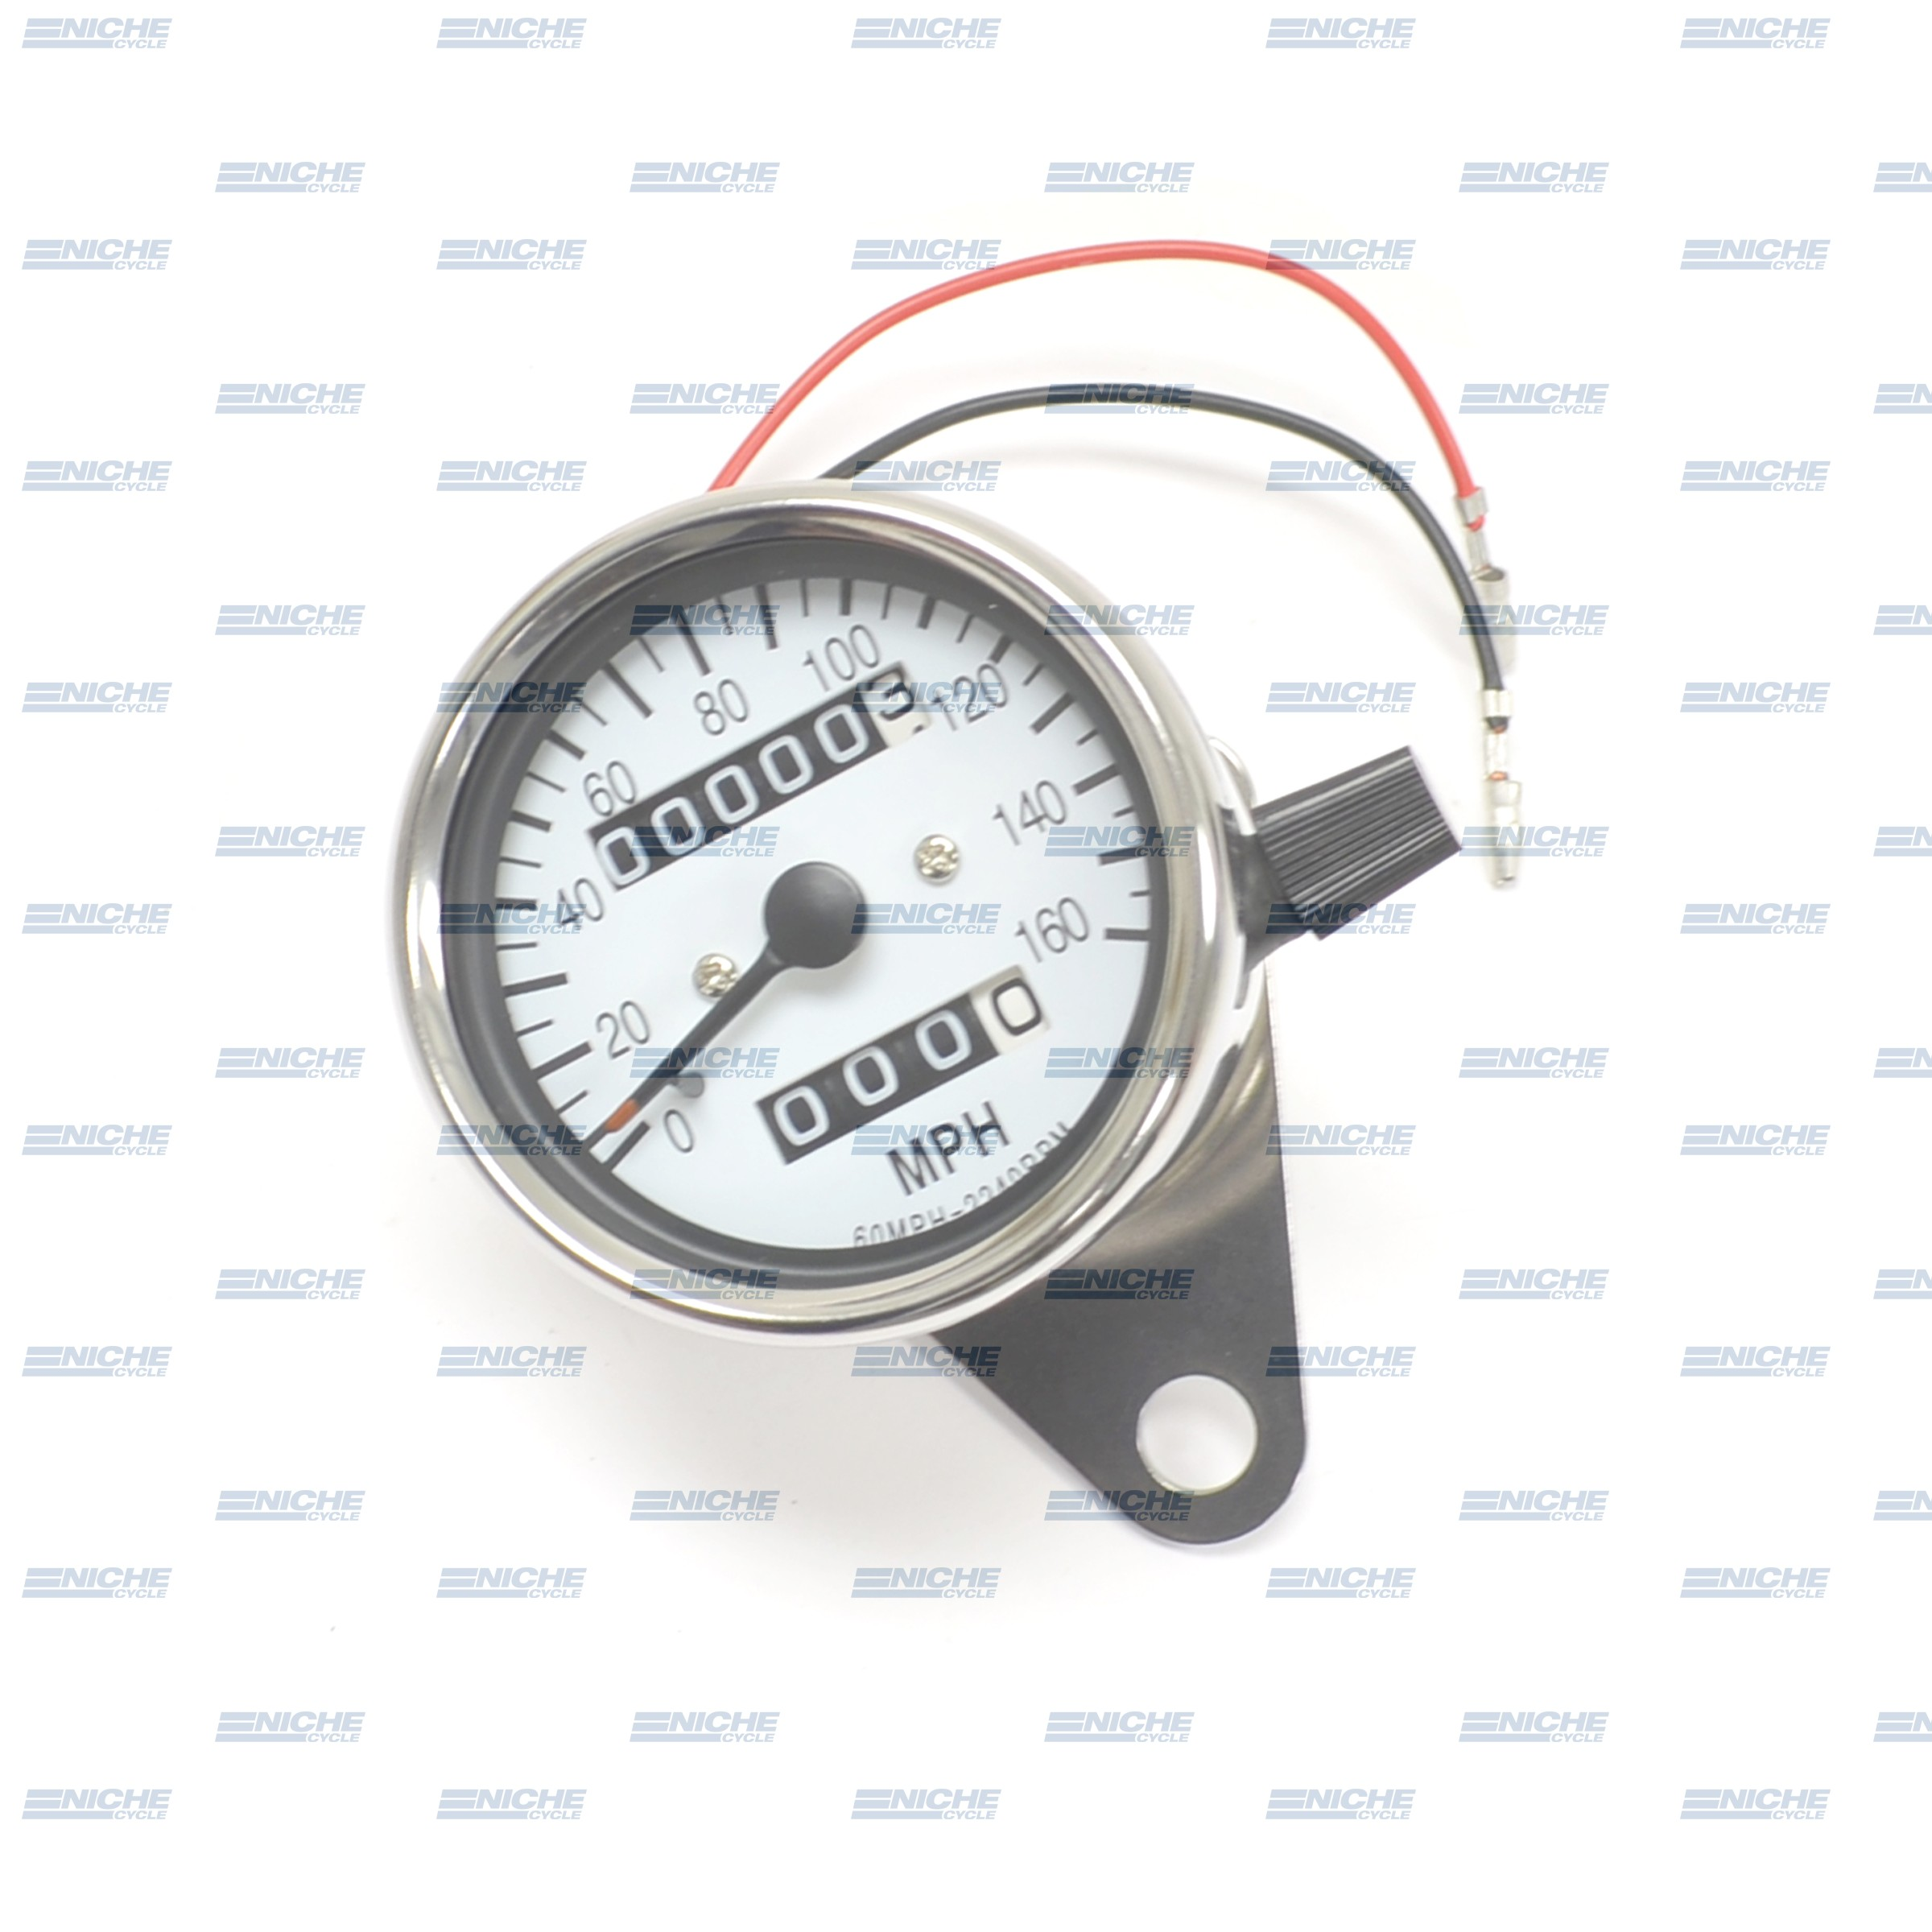 Mini Speedometer Gauge 160 MPH - 2.1:1 Ratio 58-43664A